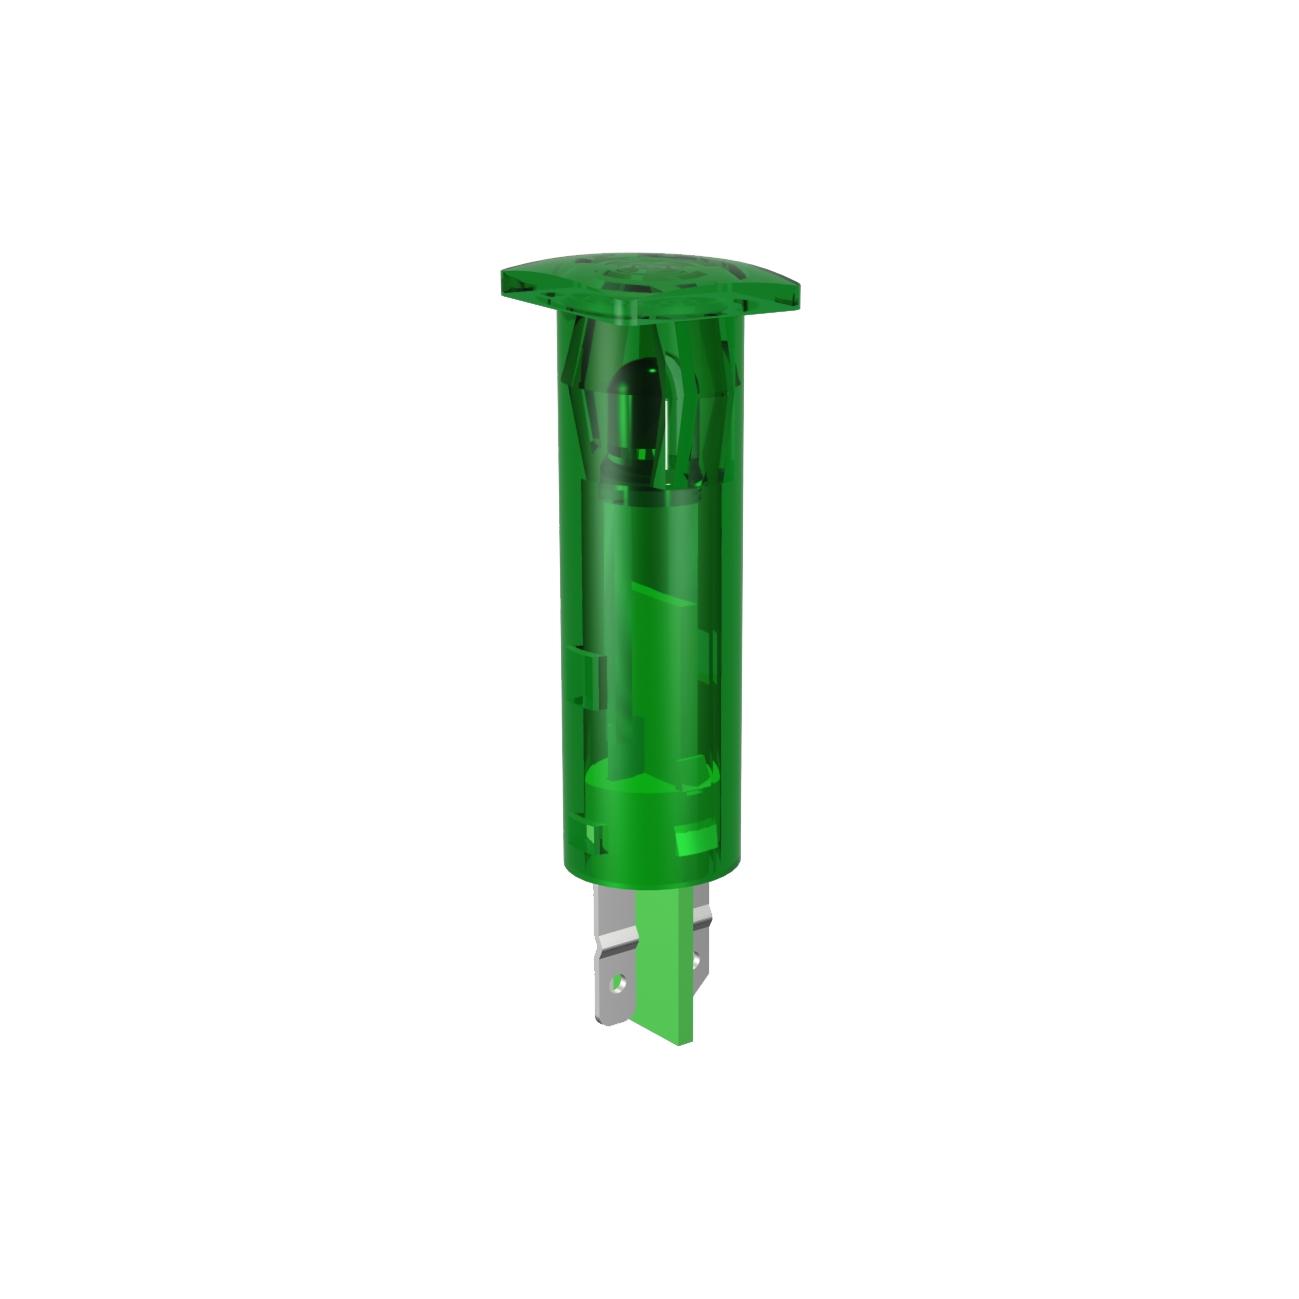 LED-Symbol-Leuchte Ø 6mm Blendenkopf quadratisch